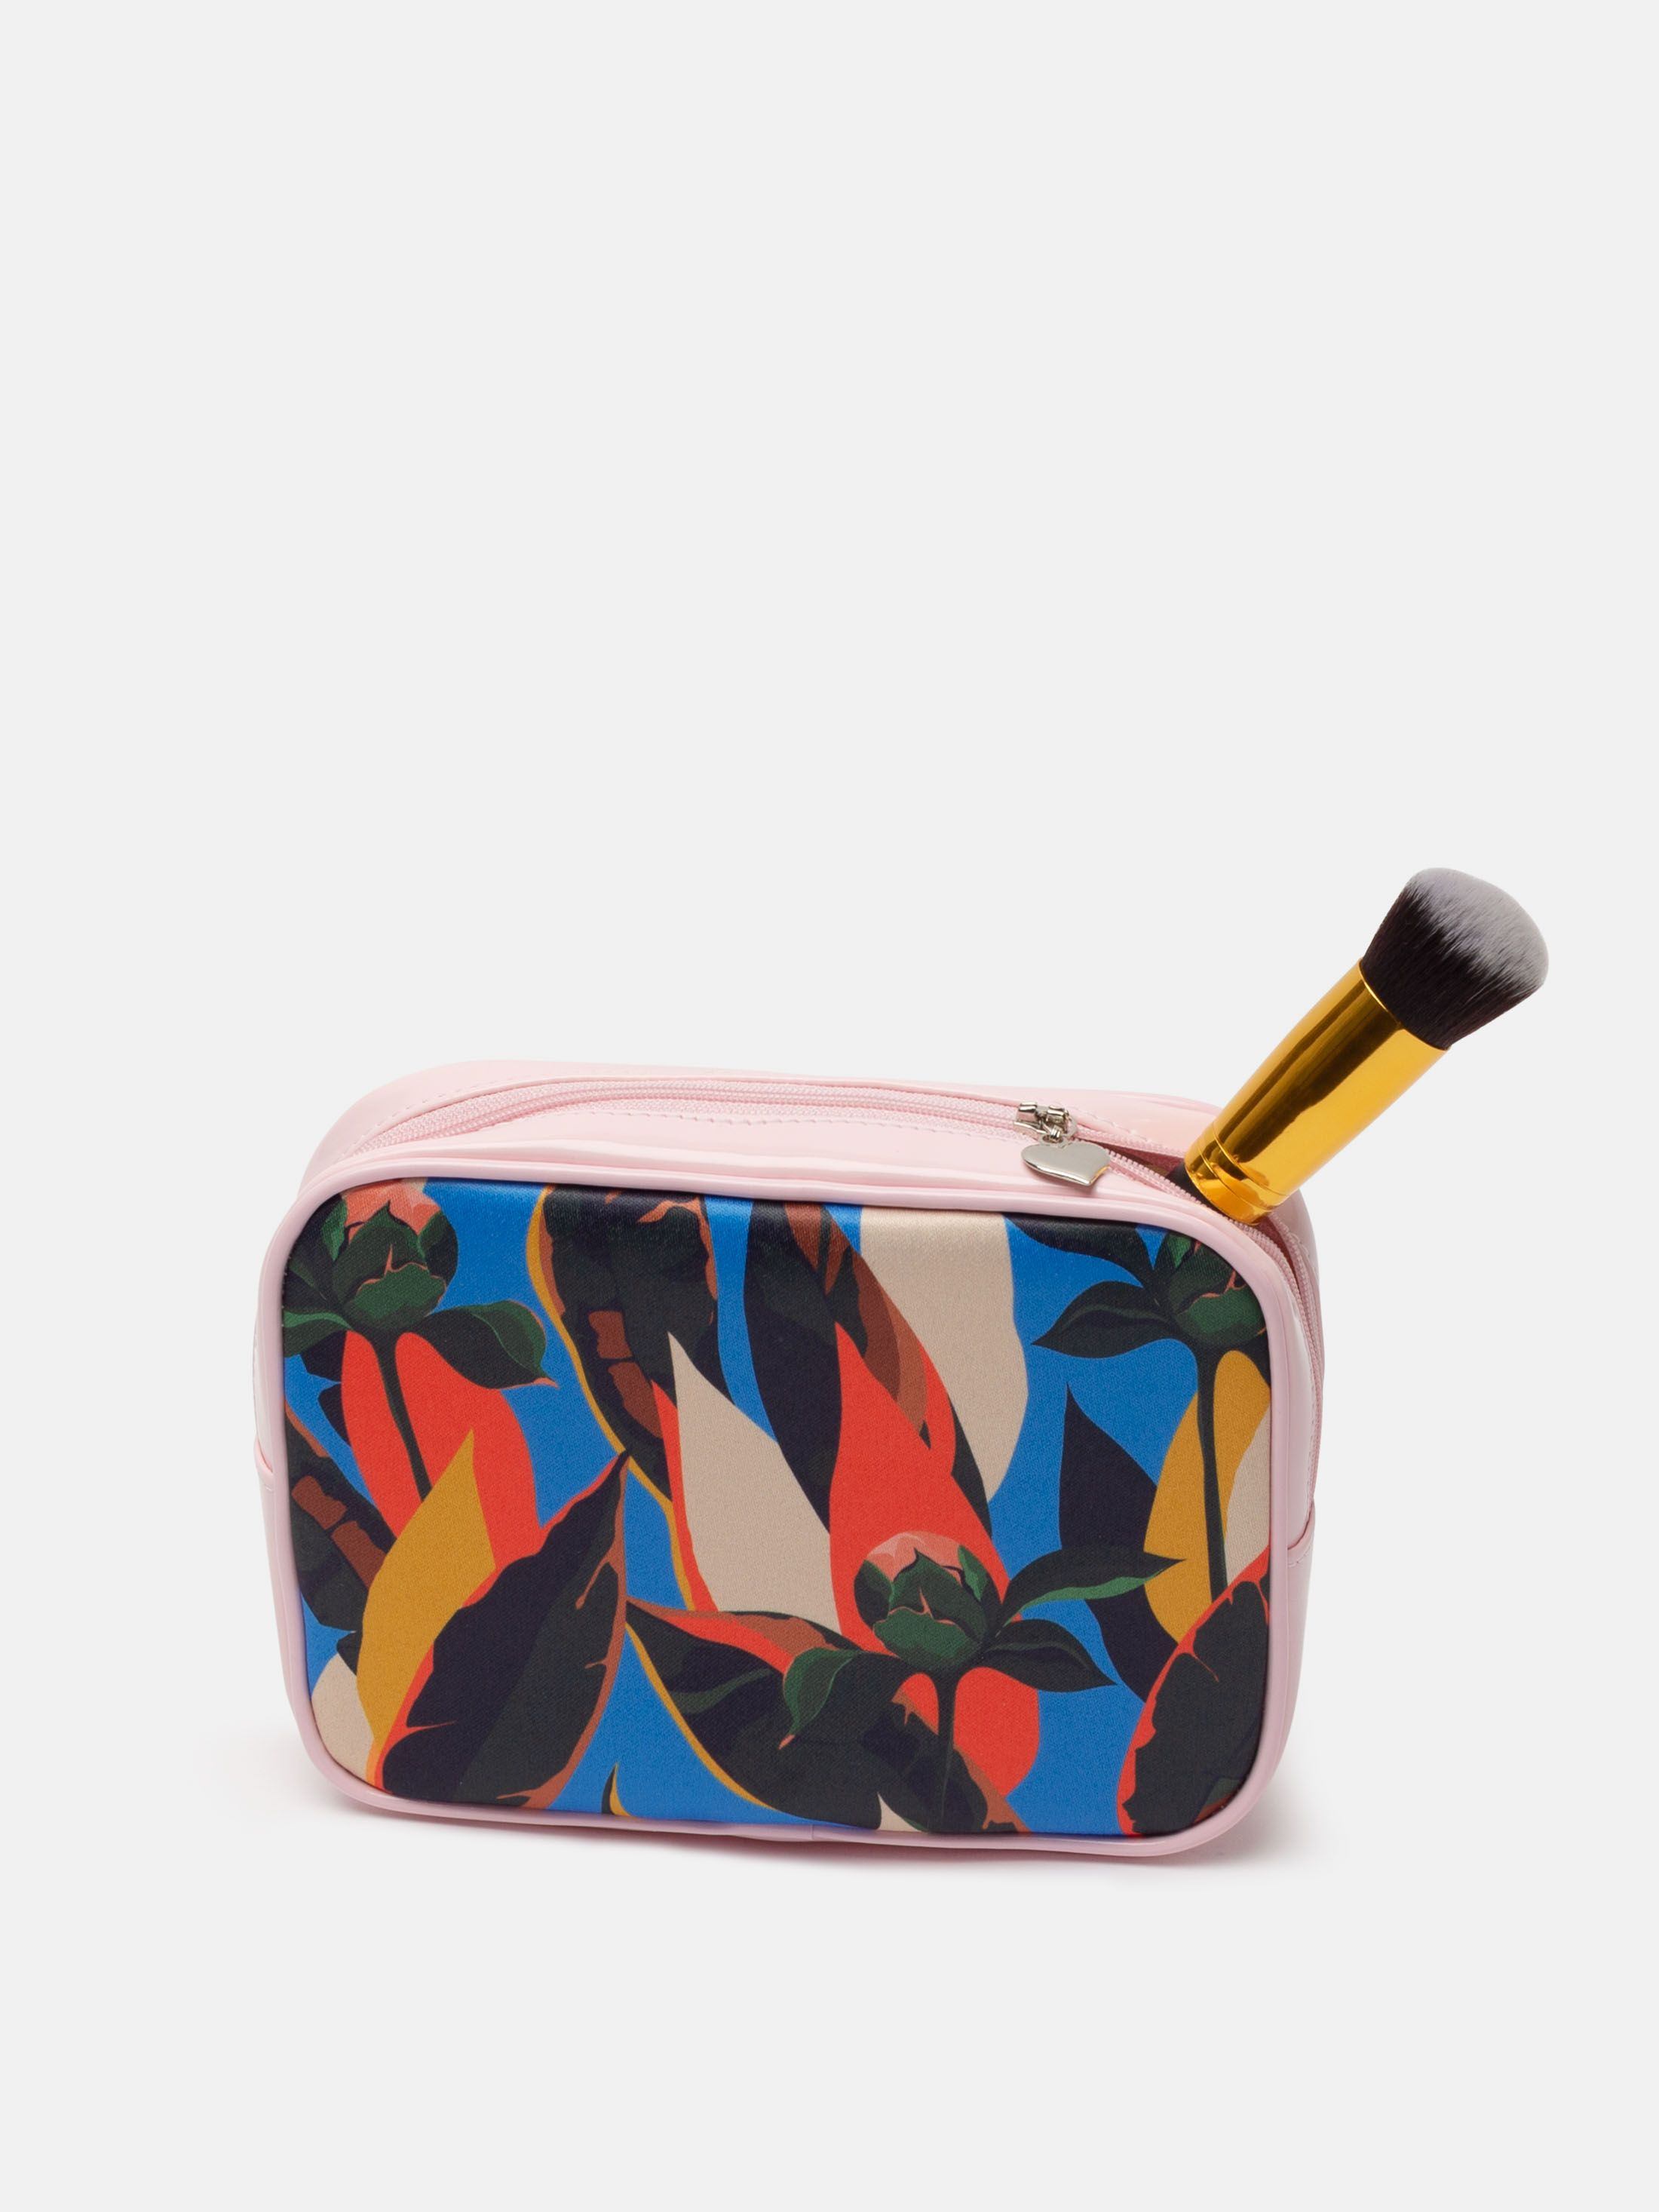 Custom Makeup Bags Design Your Own